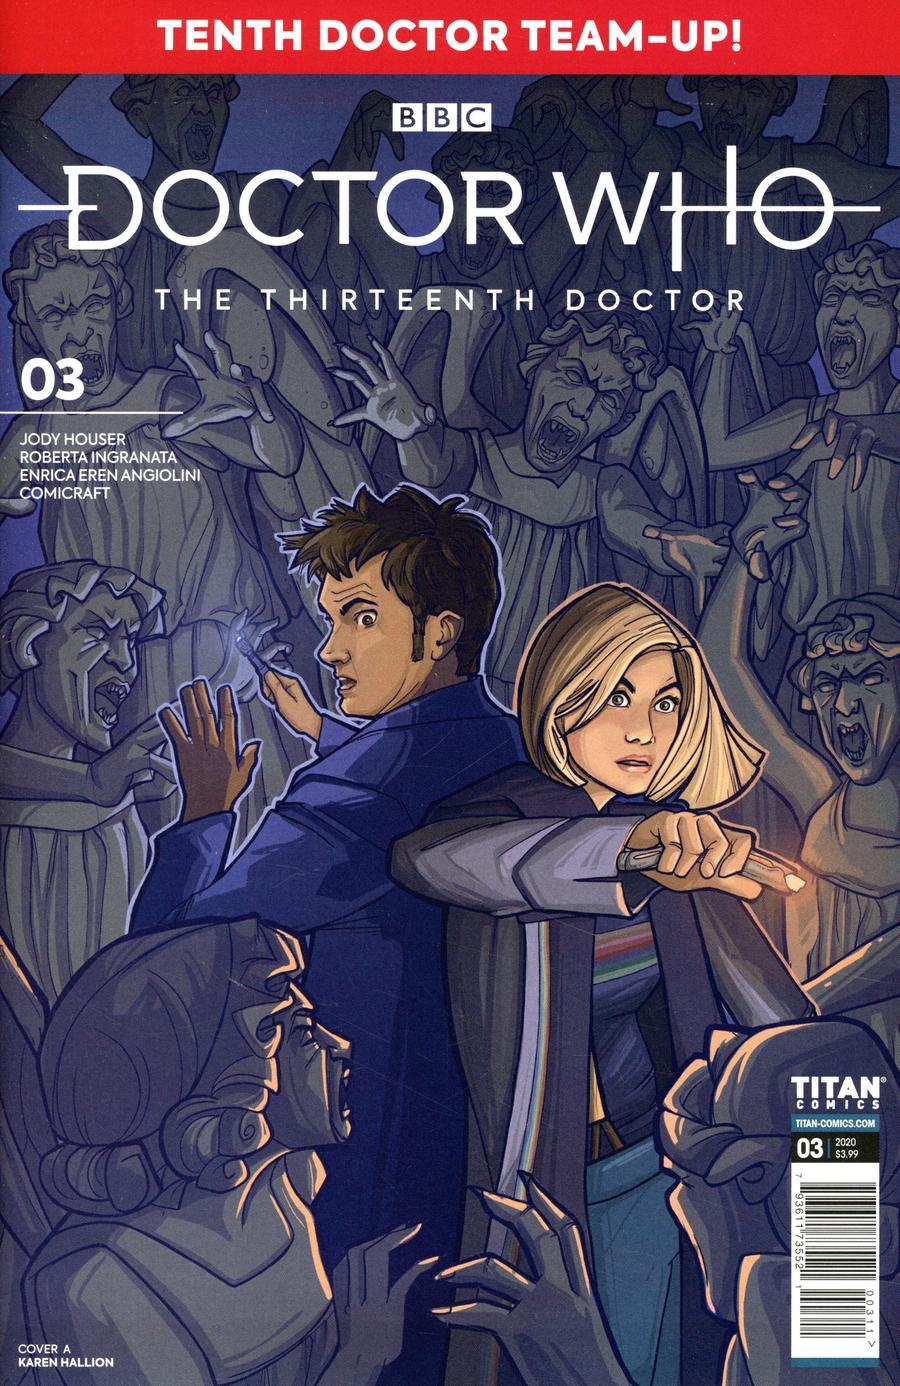 Doctor Who 13th Doctor Season 2 #3 Cover A Regular Karen Hallion Cover